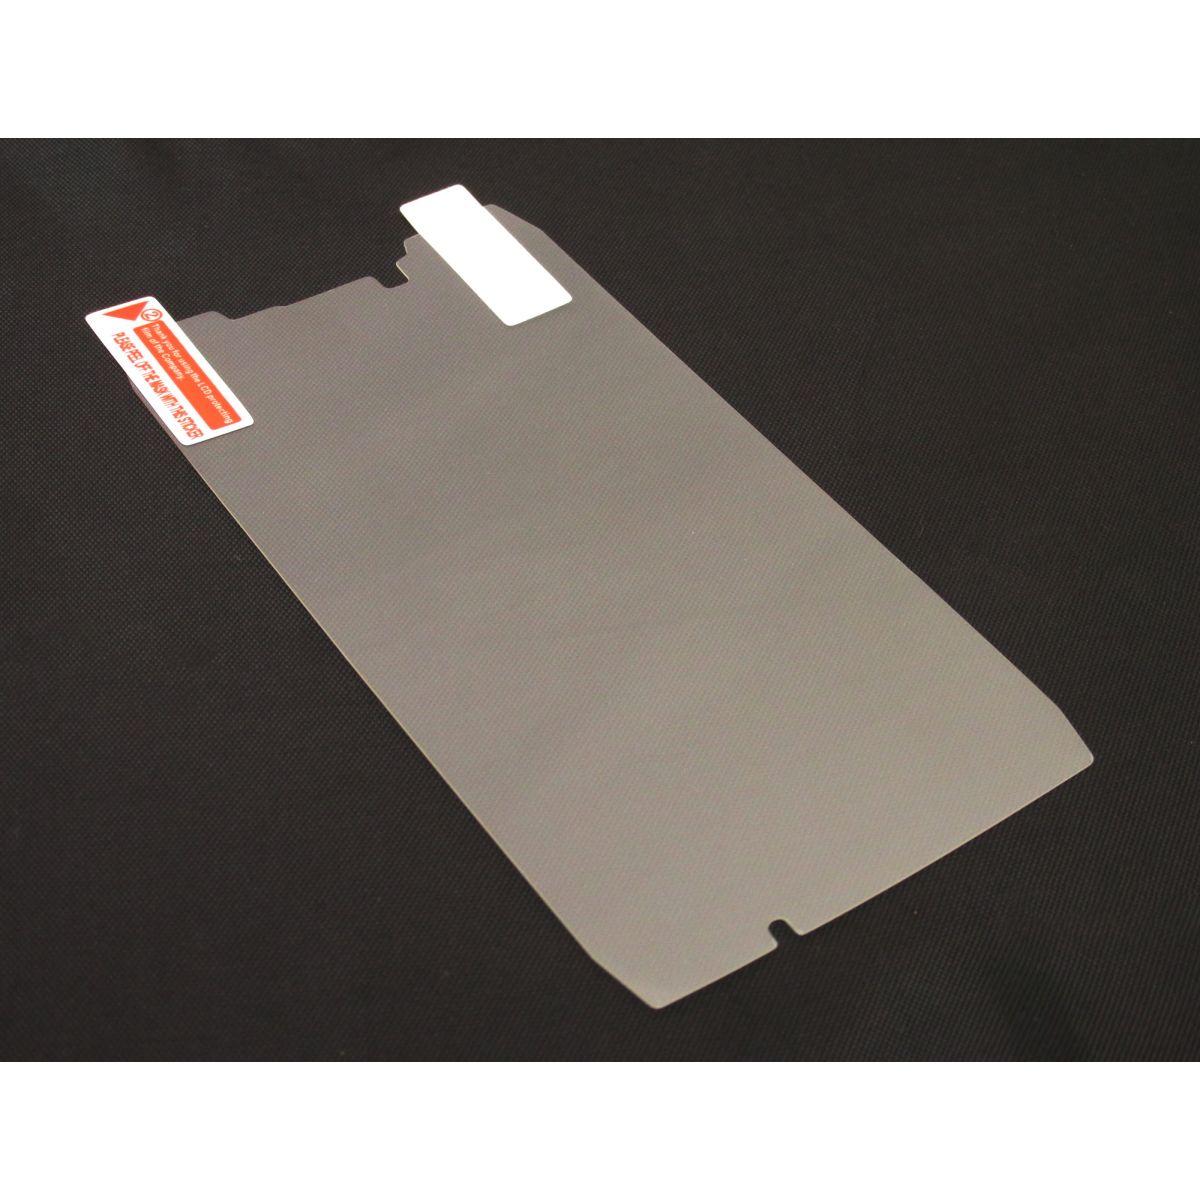 Película Protetora para Motorola RAZR Xt910 - Fosca